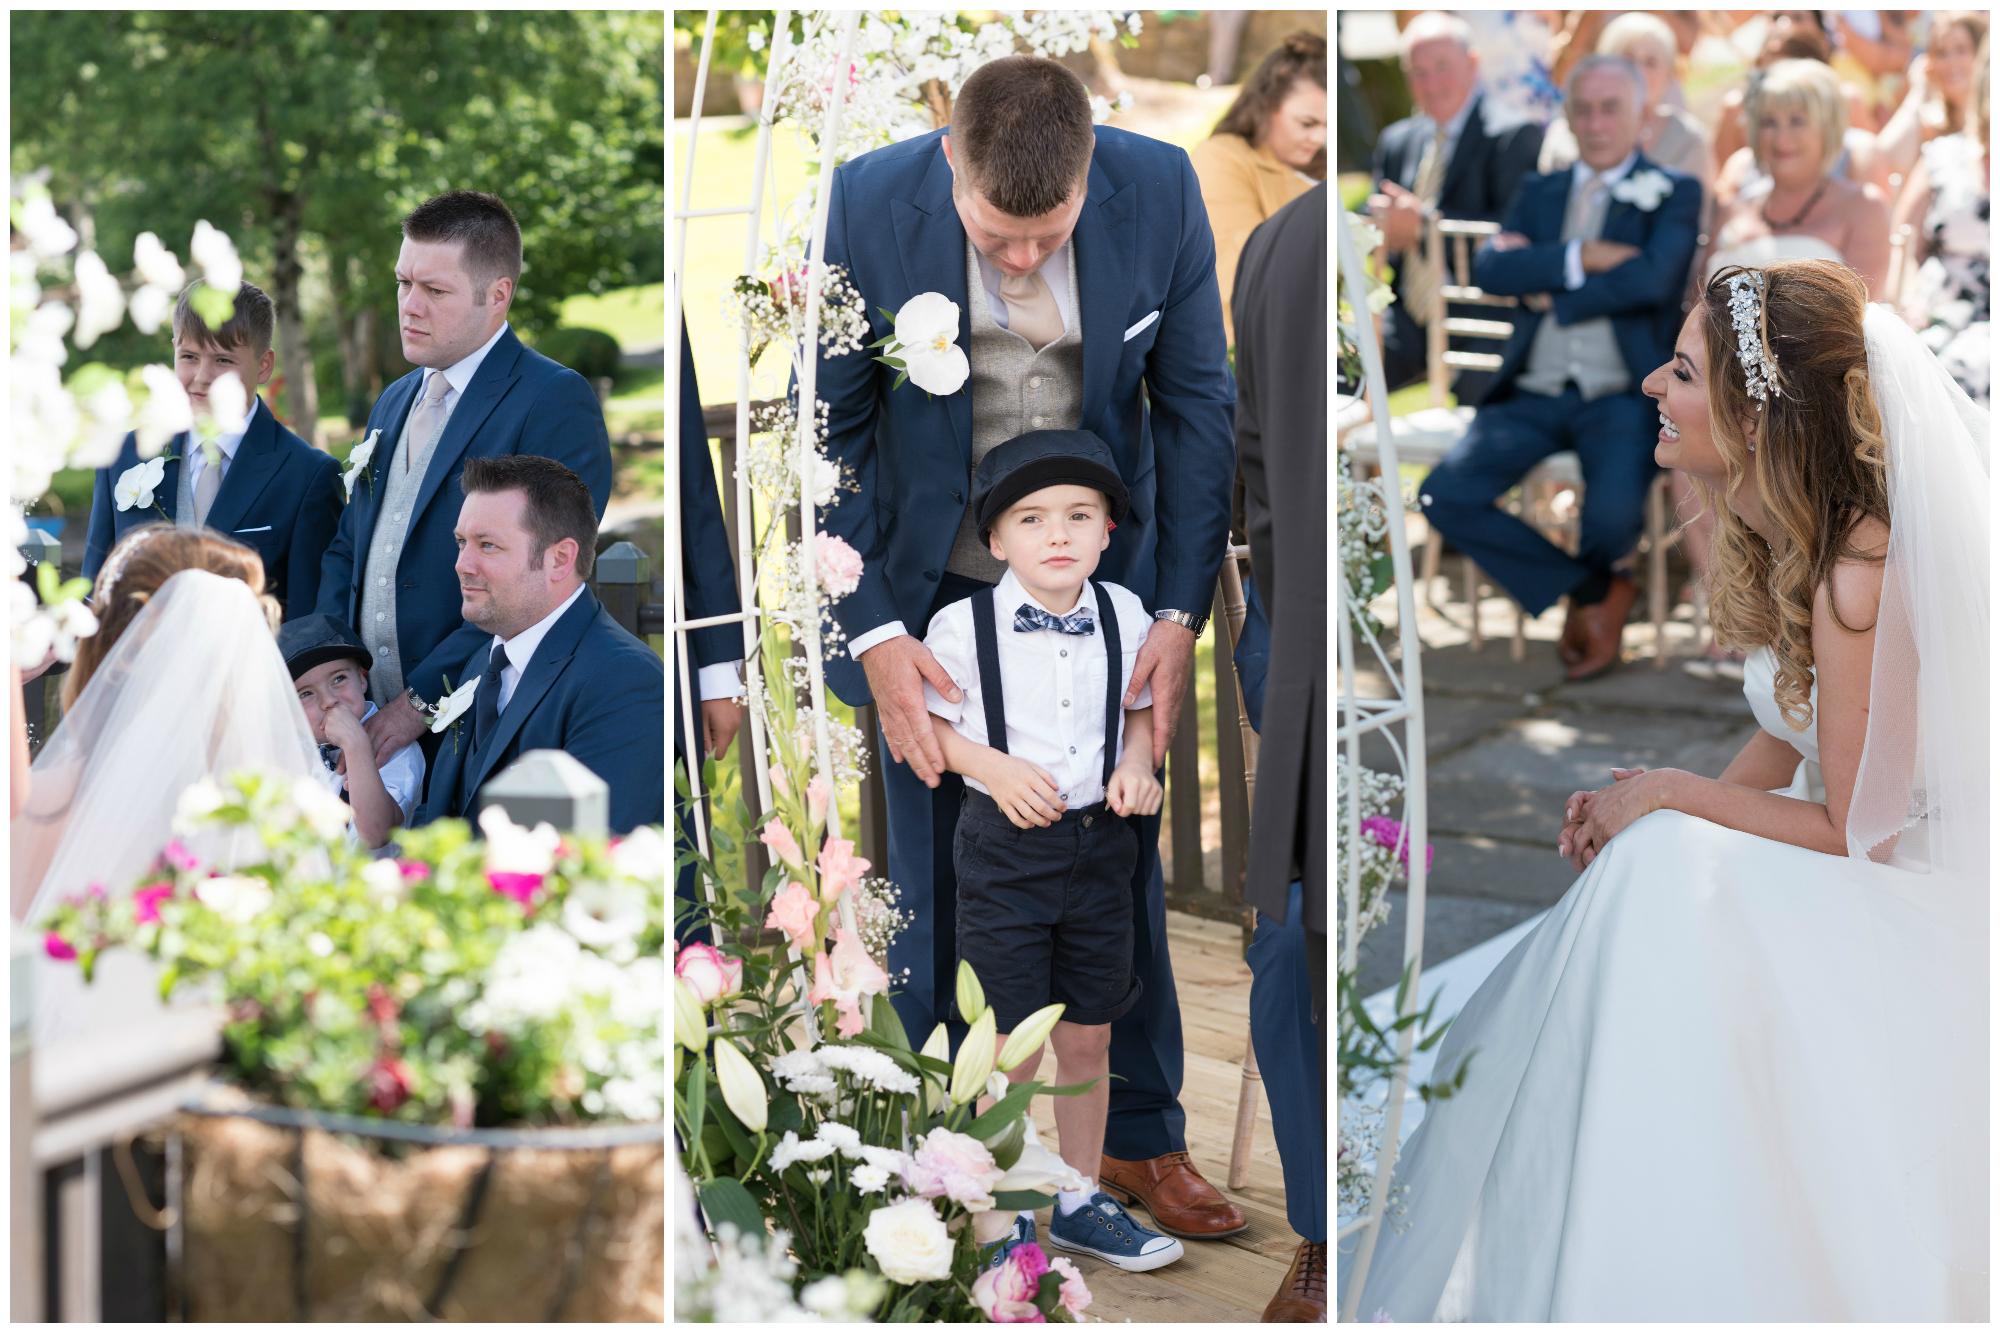 Lusty Beg Island Northern Ireland Wedding Photographers Pure Photo N.I Bride Groom Ceremony Portrait